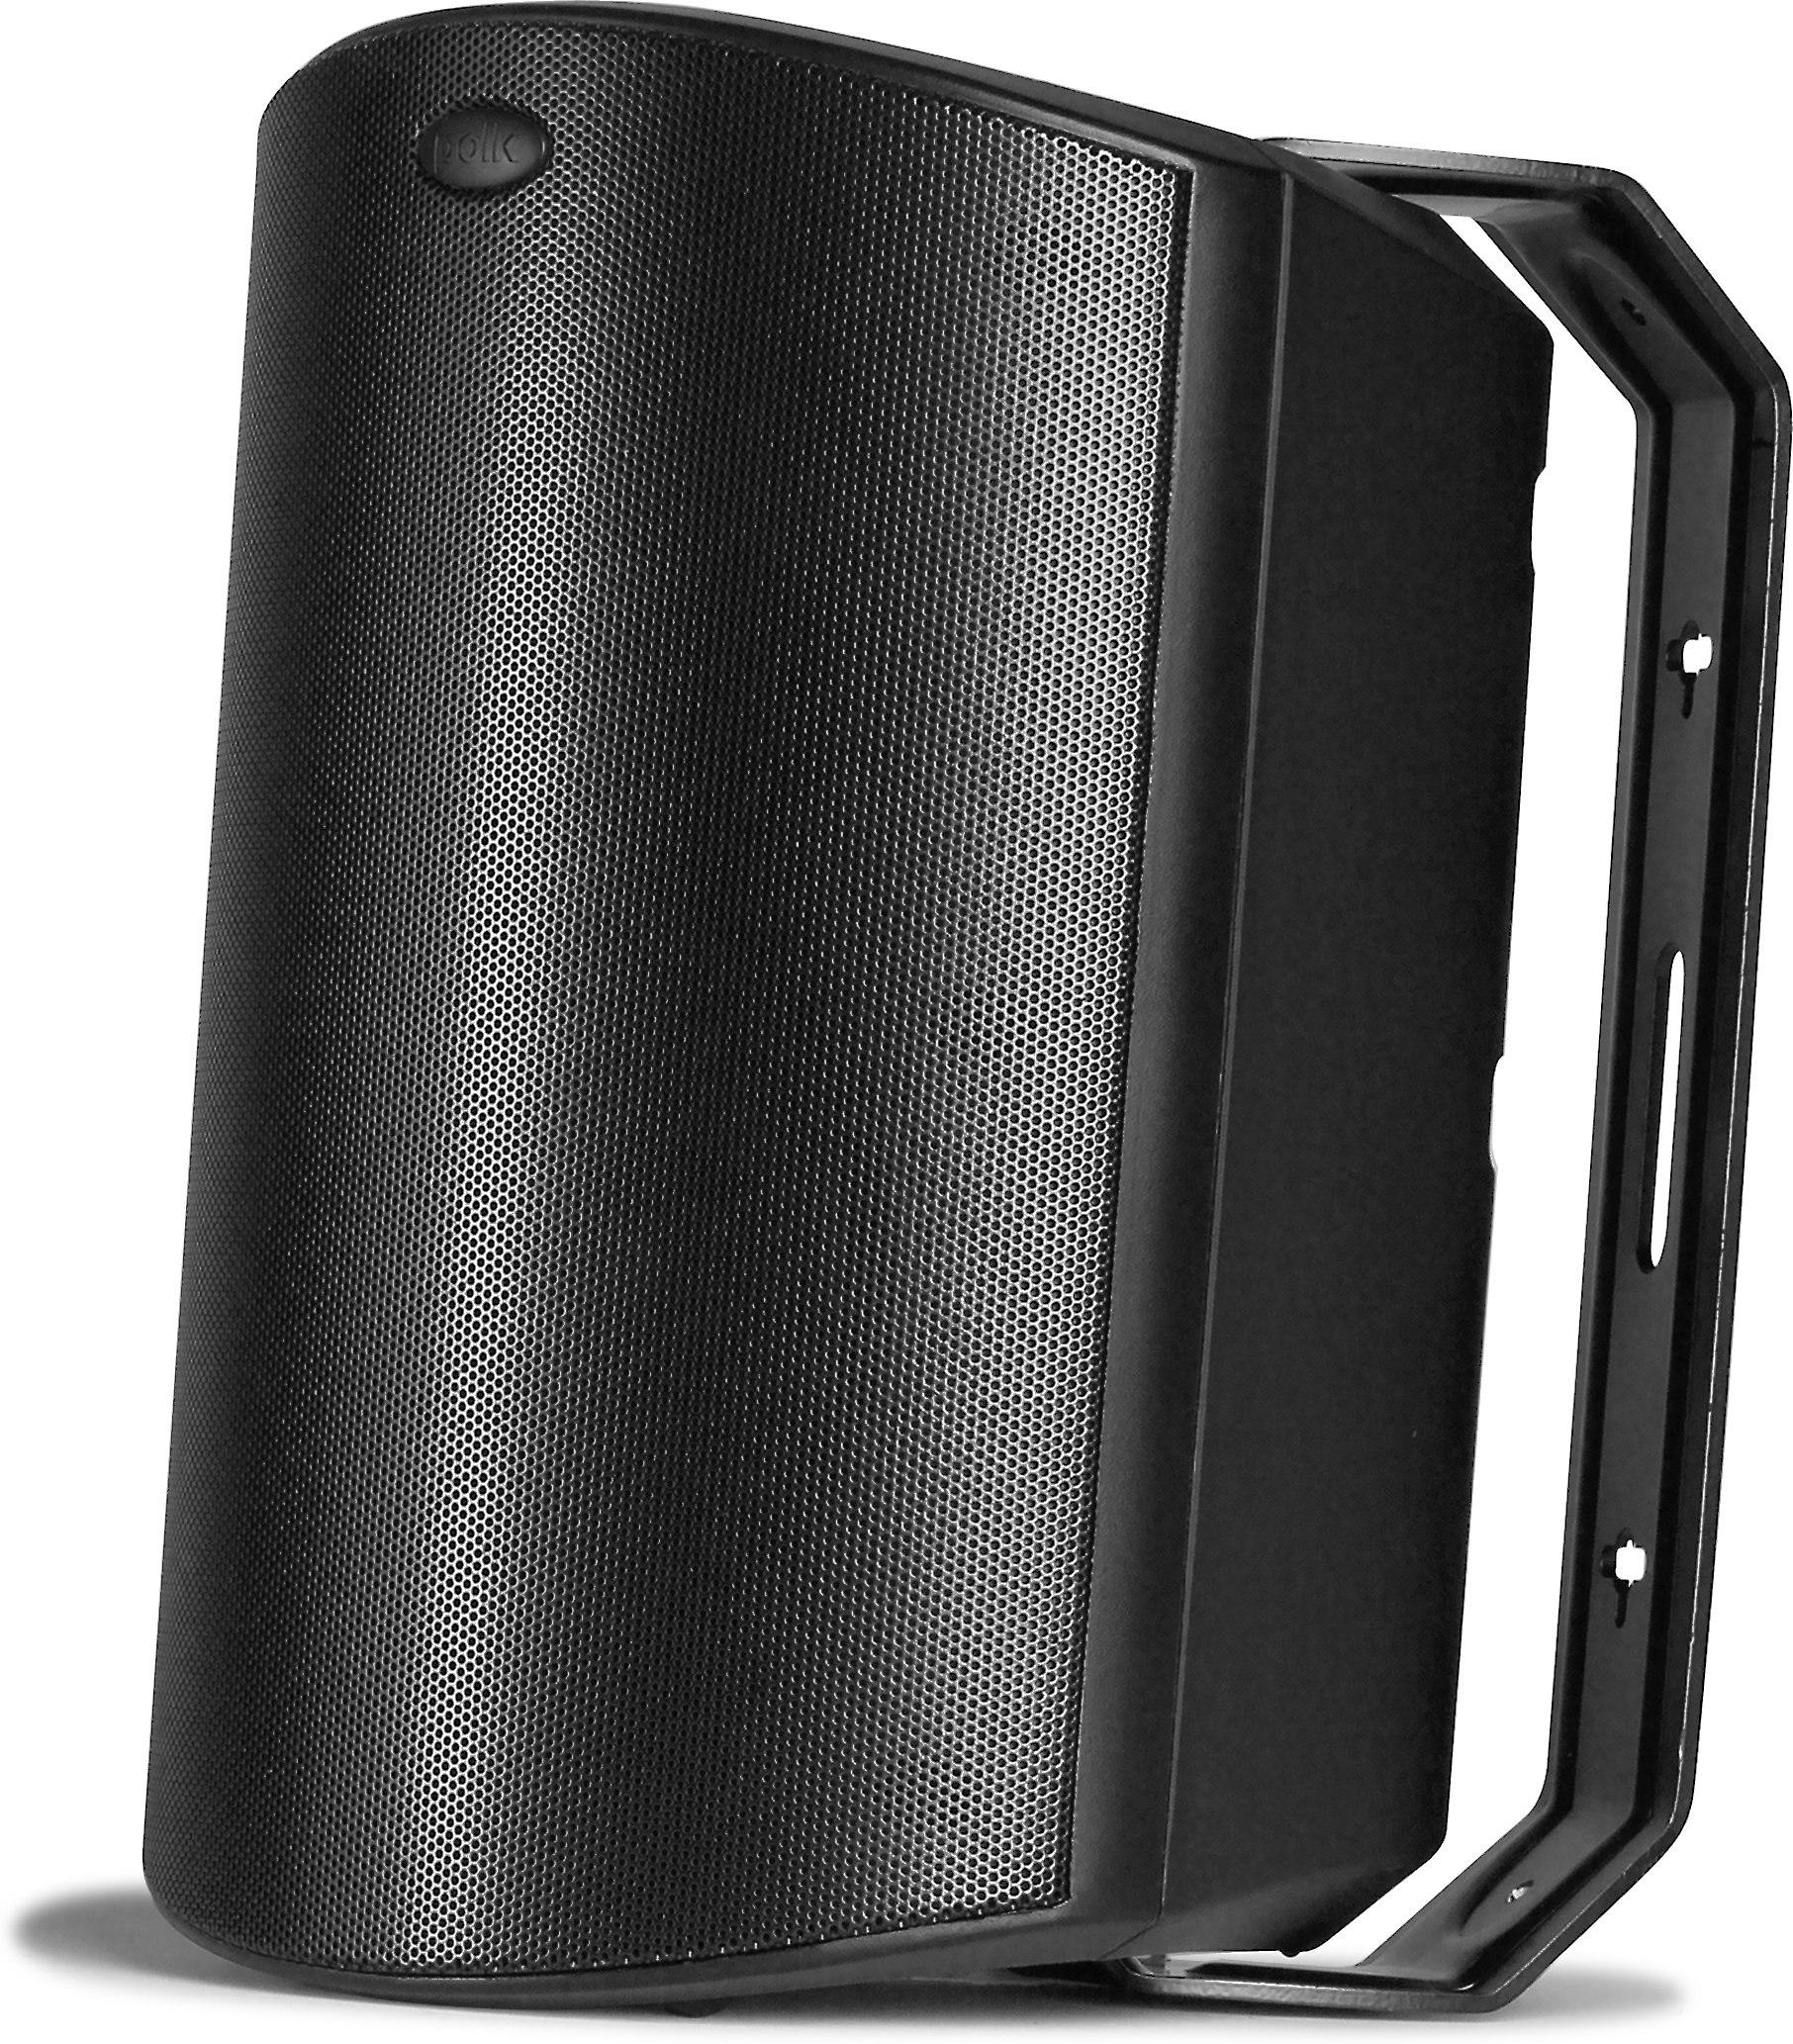 hight resolution of polk audio atrium8 sdi black all weather indoor outdoor speaker speaker wiring in wall harbor freight digital angle gauge bose speaker